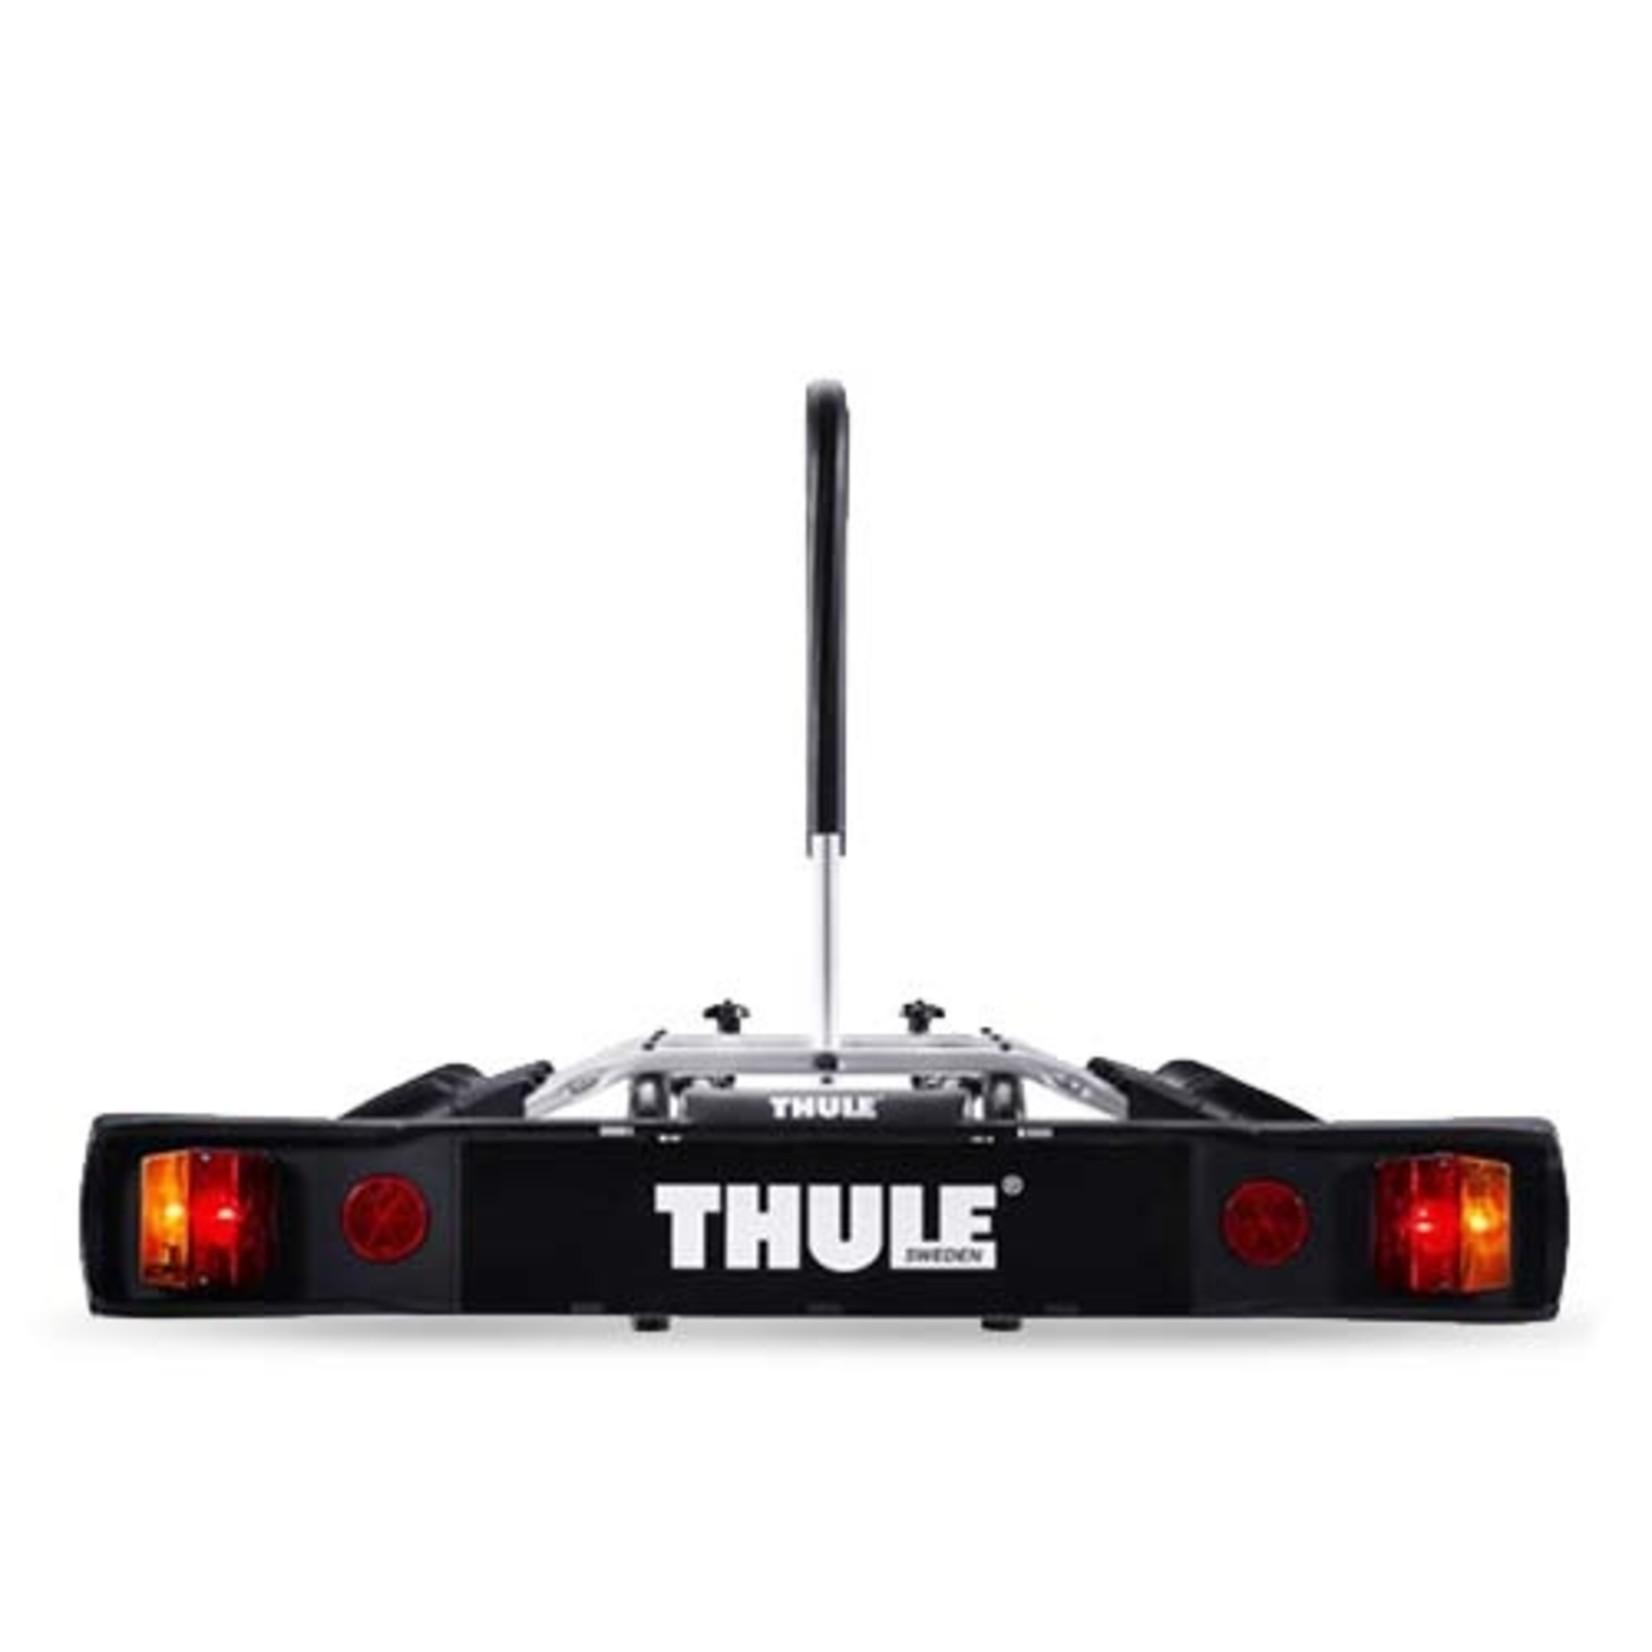 THULE THULE 9503 RIDE ON 3 BIKE TOW BAR